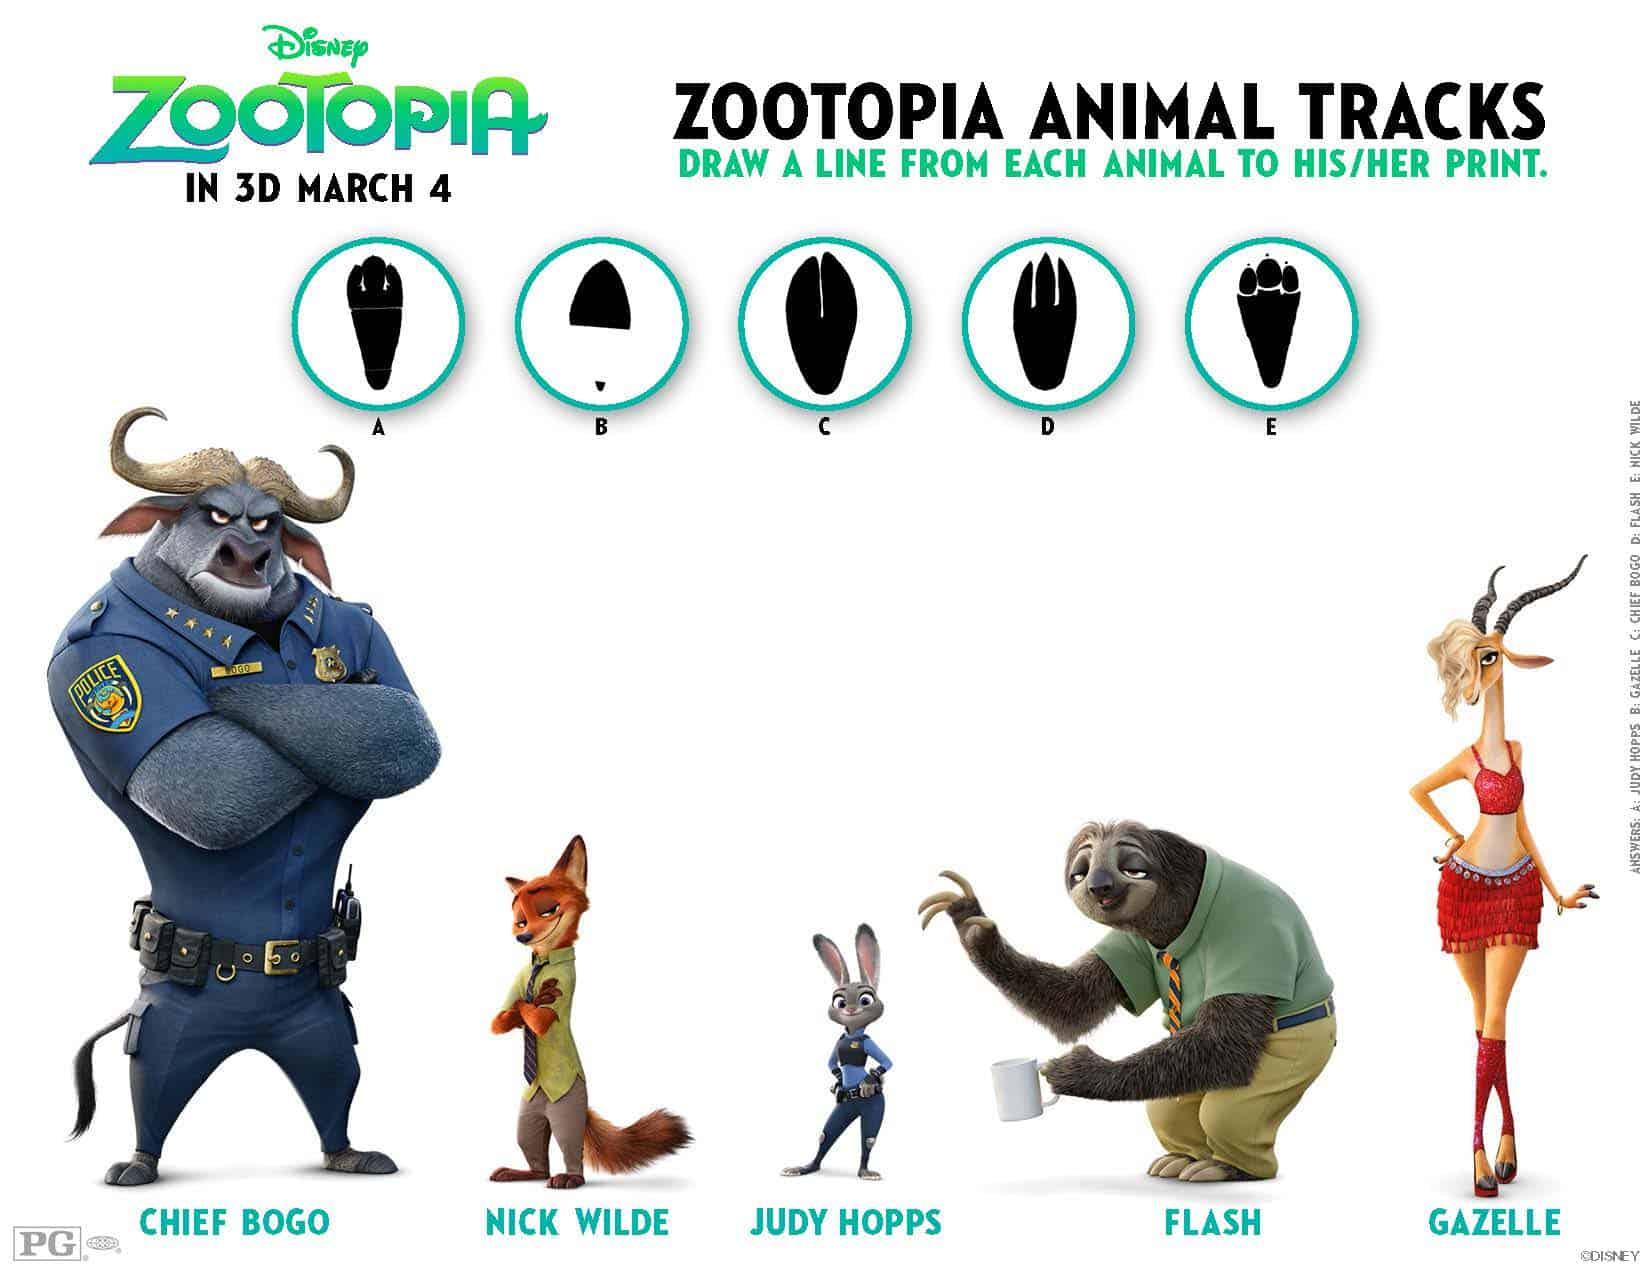 Printable coloring pages zootopia - Zootopia Free Printable Zootopia Coloring Sheets Zootopia Free Activites Free Zootopia Printable